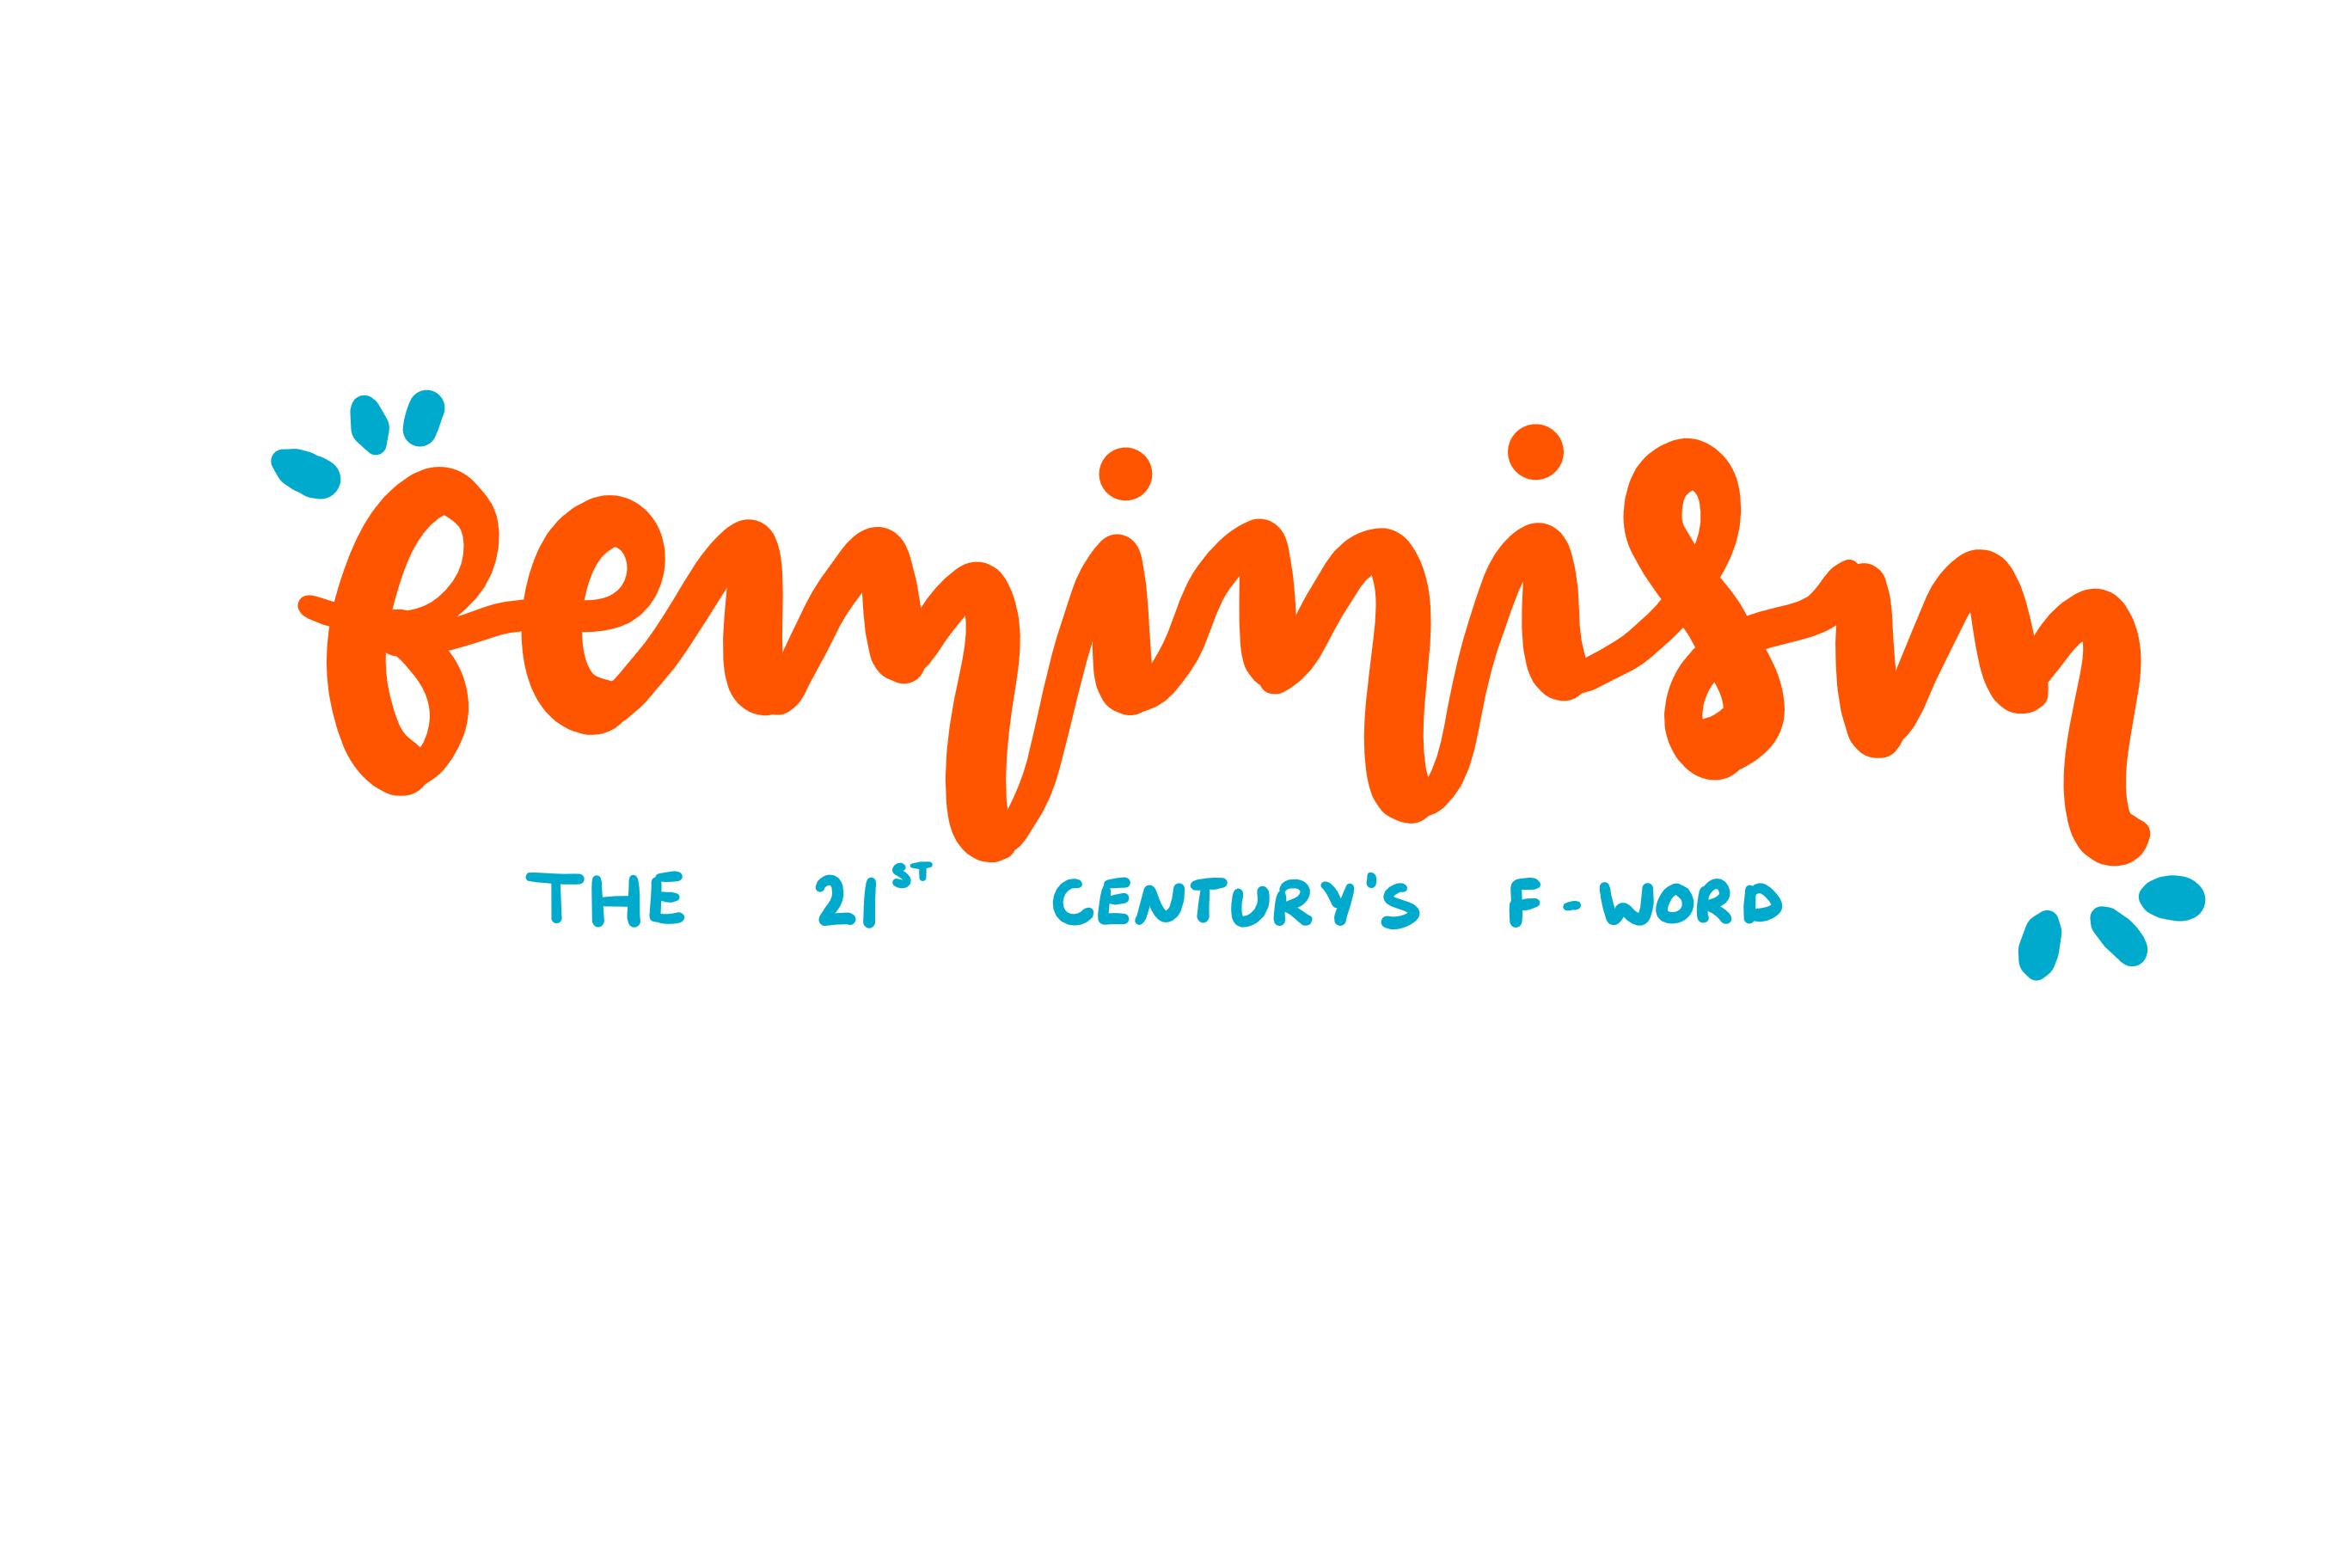 Feminism: the 21st Century's F-Word